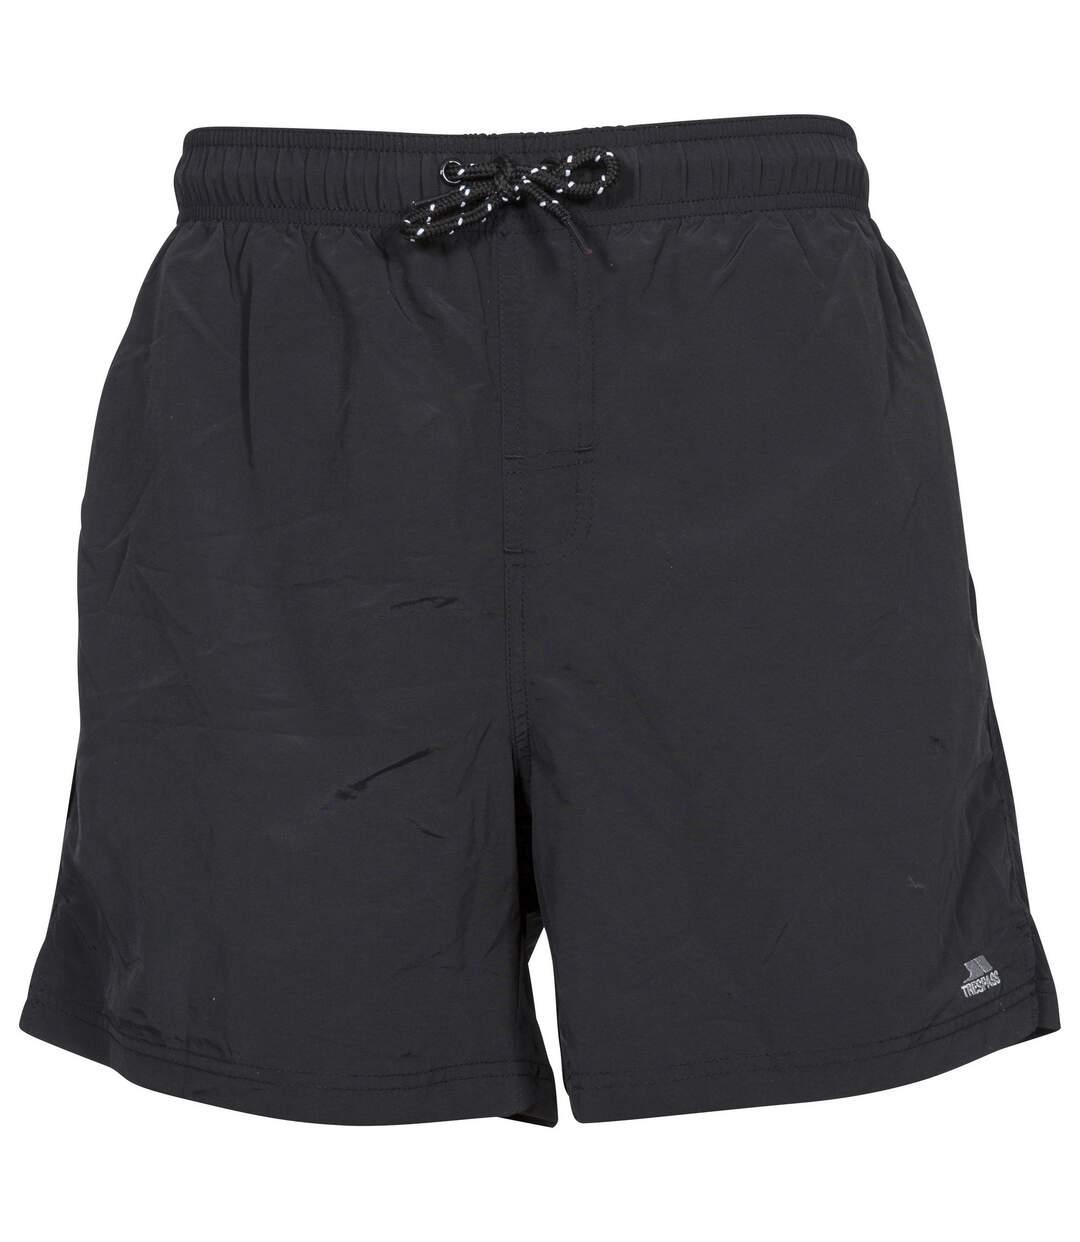 Trespass Mens Luena Swimming Shorts (Black) - UTTP4058